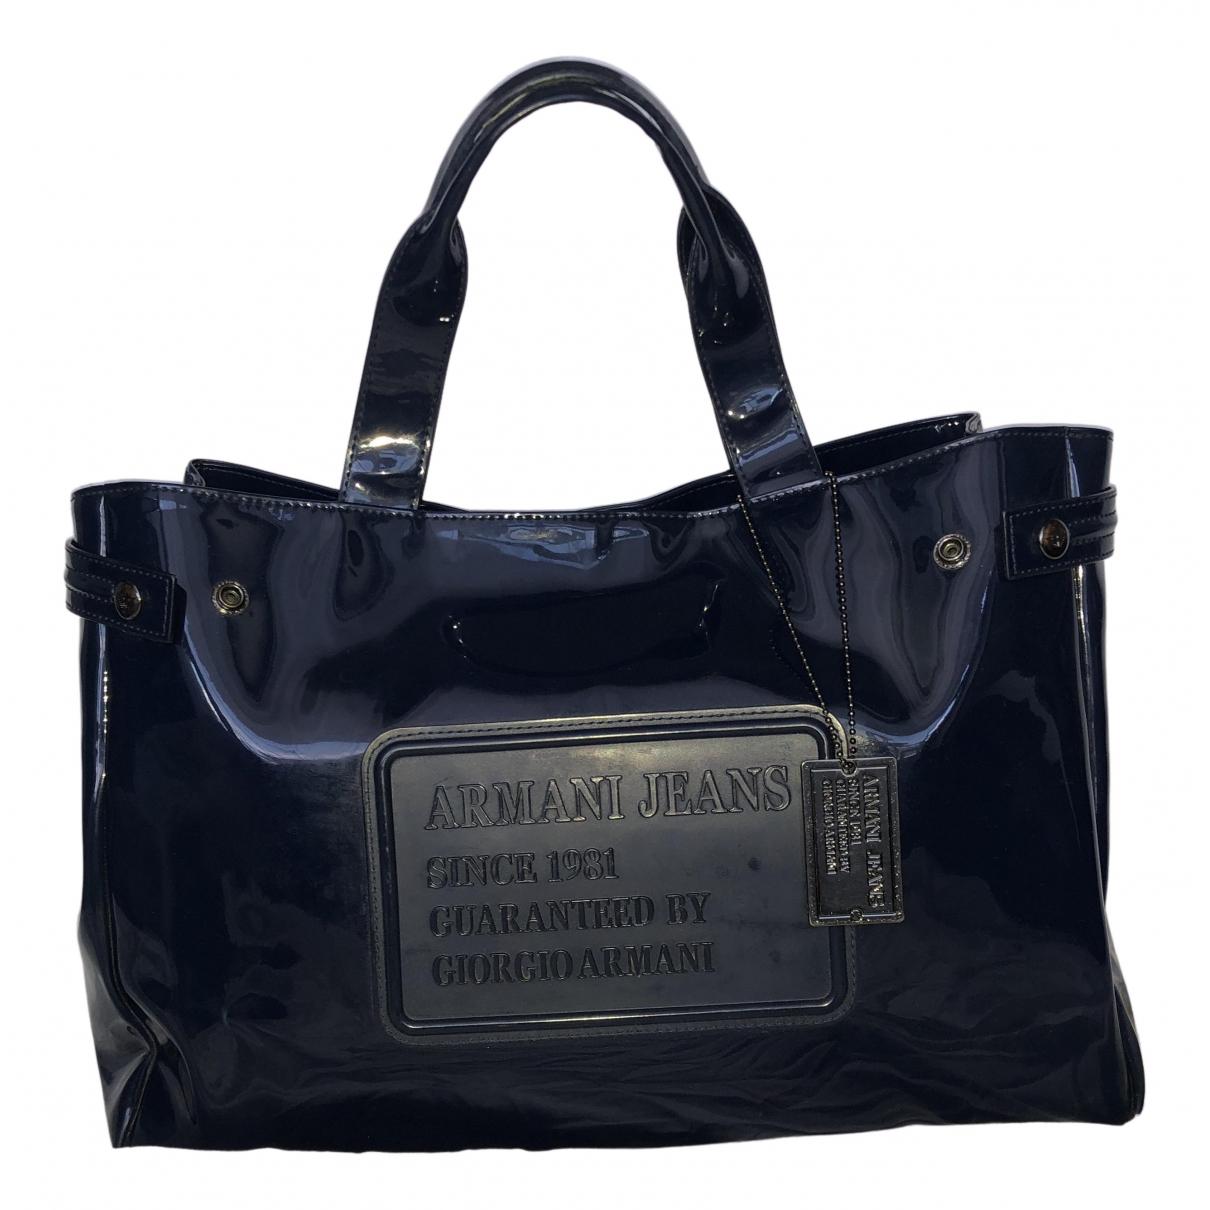 Armani Jeans N Blue Patent leather handbag for Women N